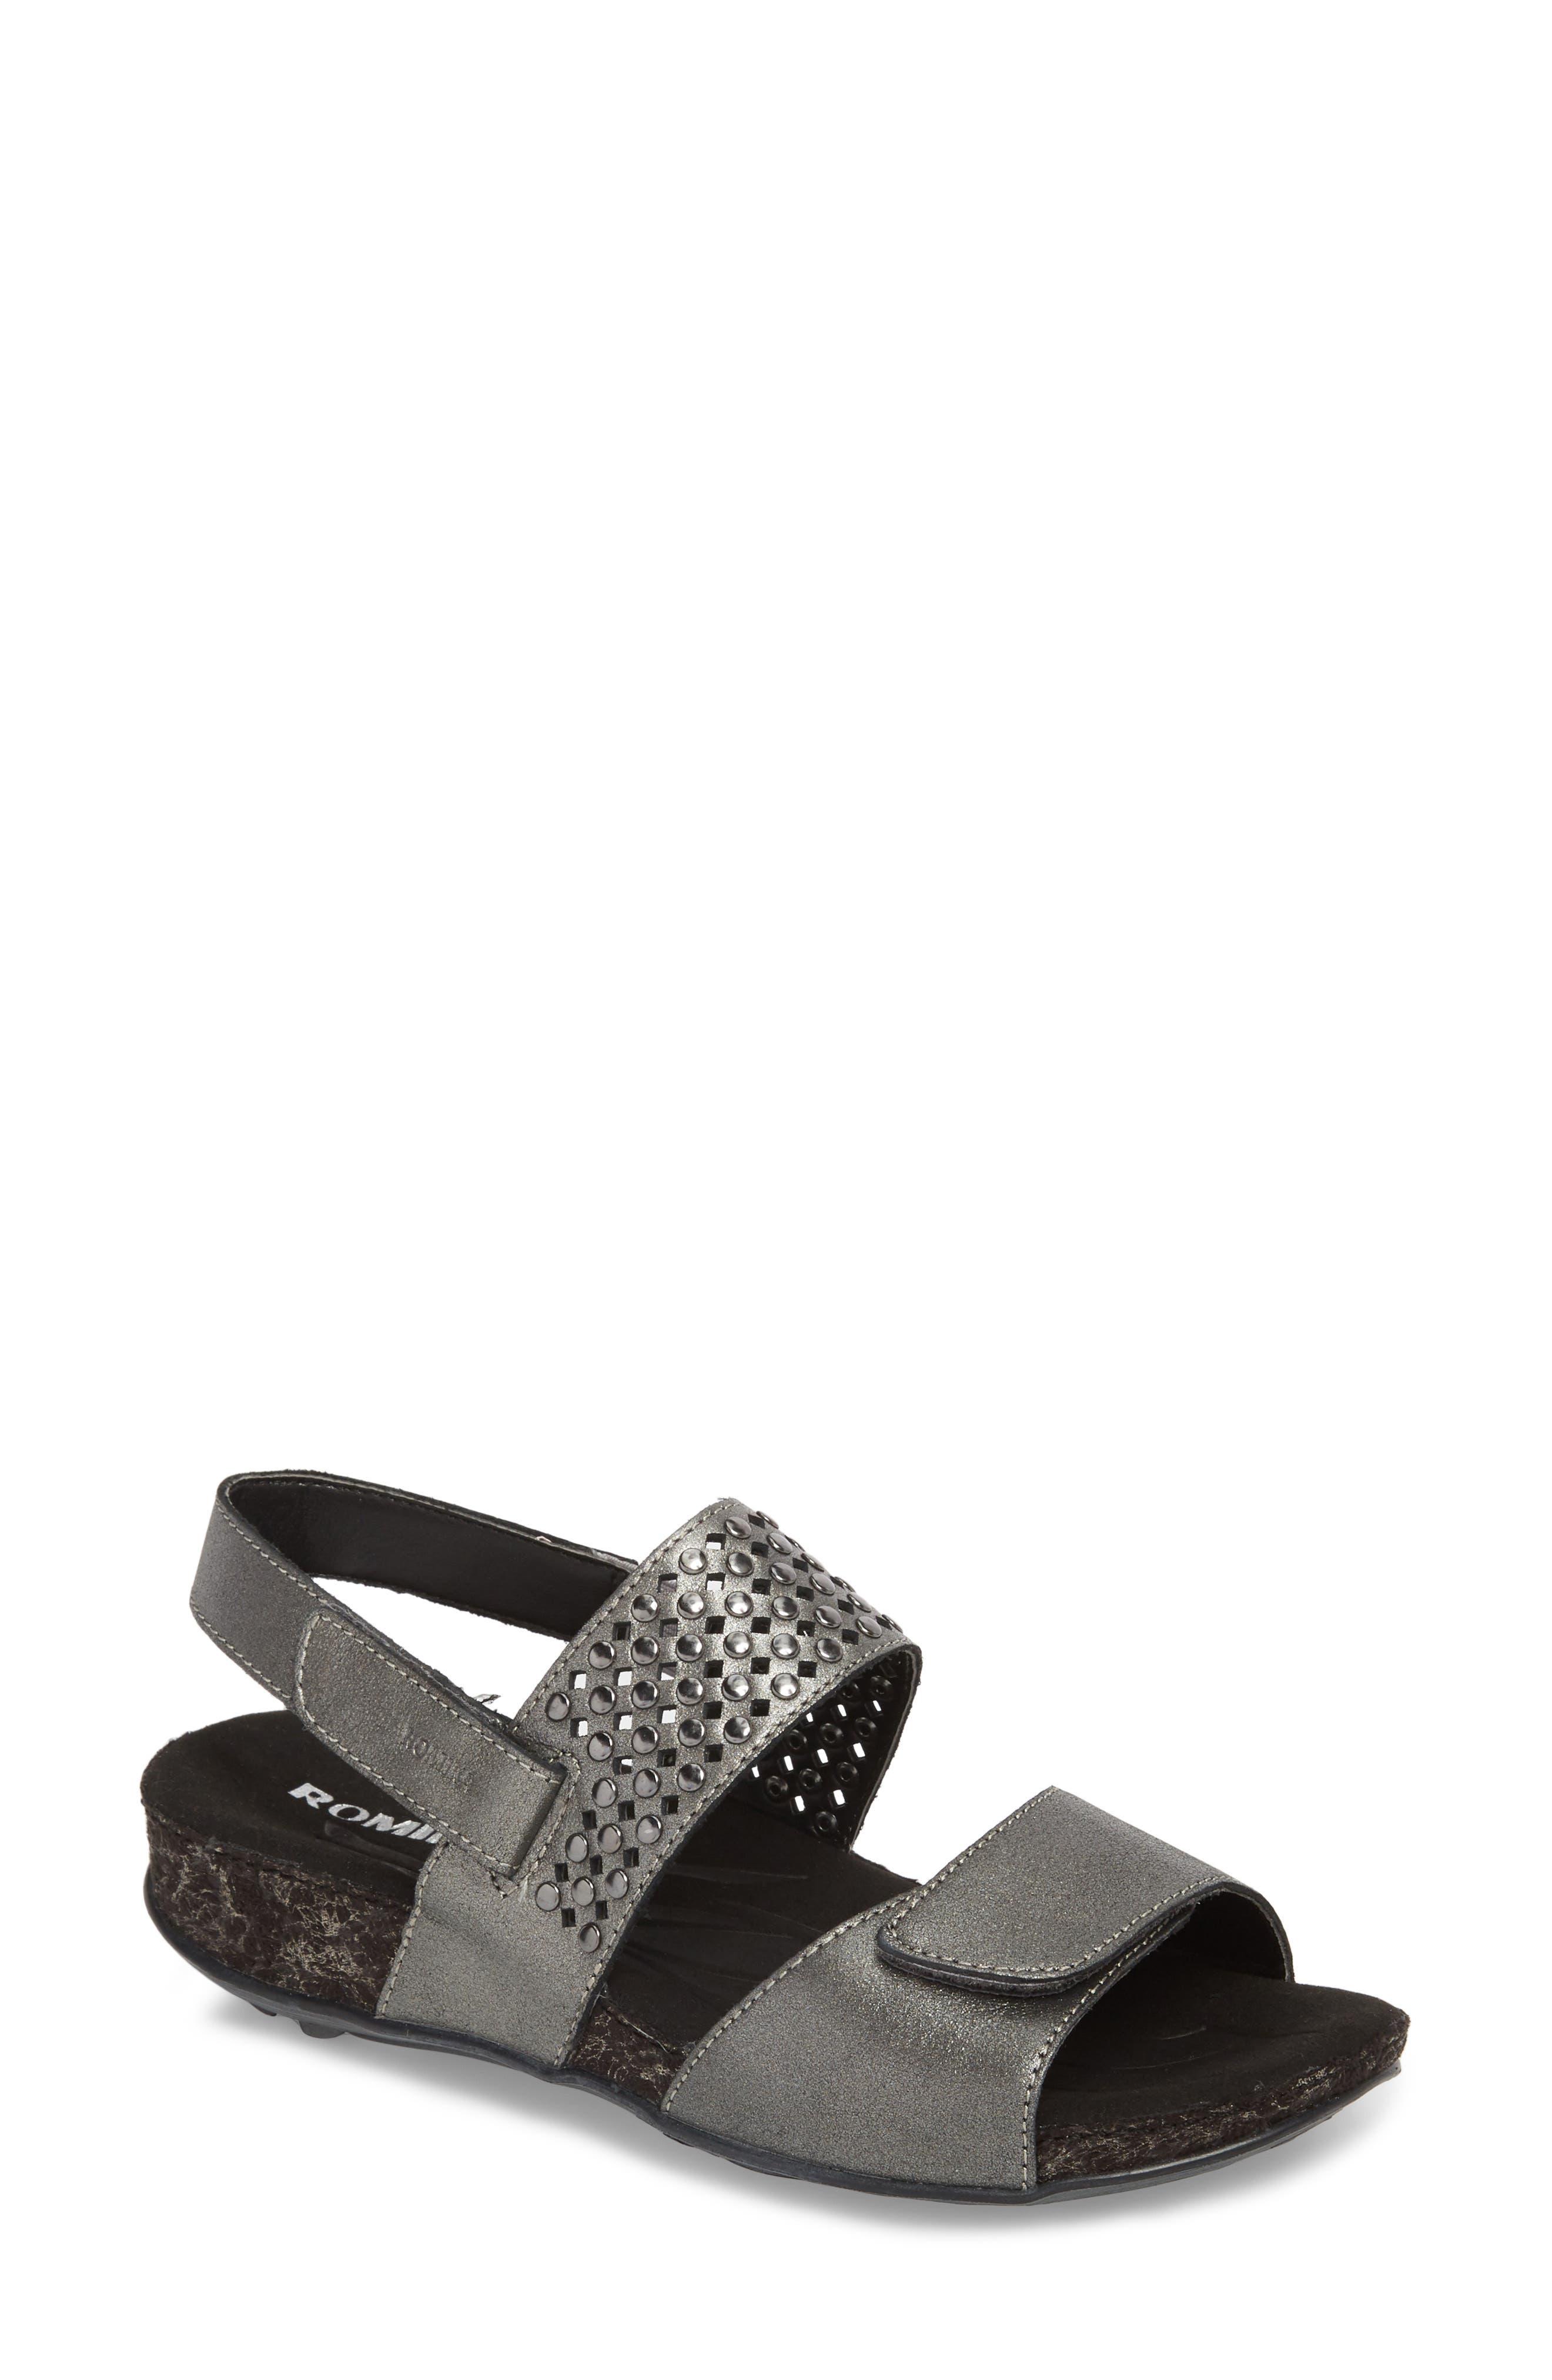 Fidschi 49 Sandal,                             Main thumbnail 1, color,                             Anthrazit Leather